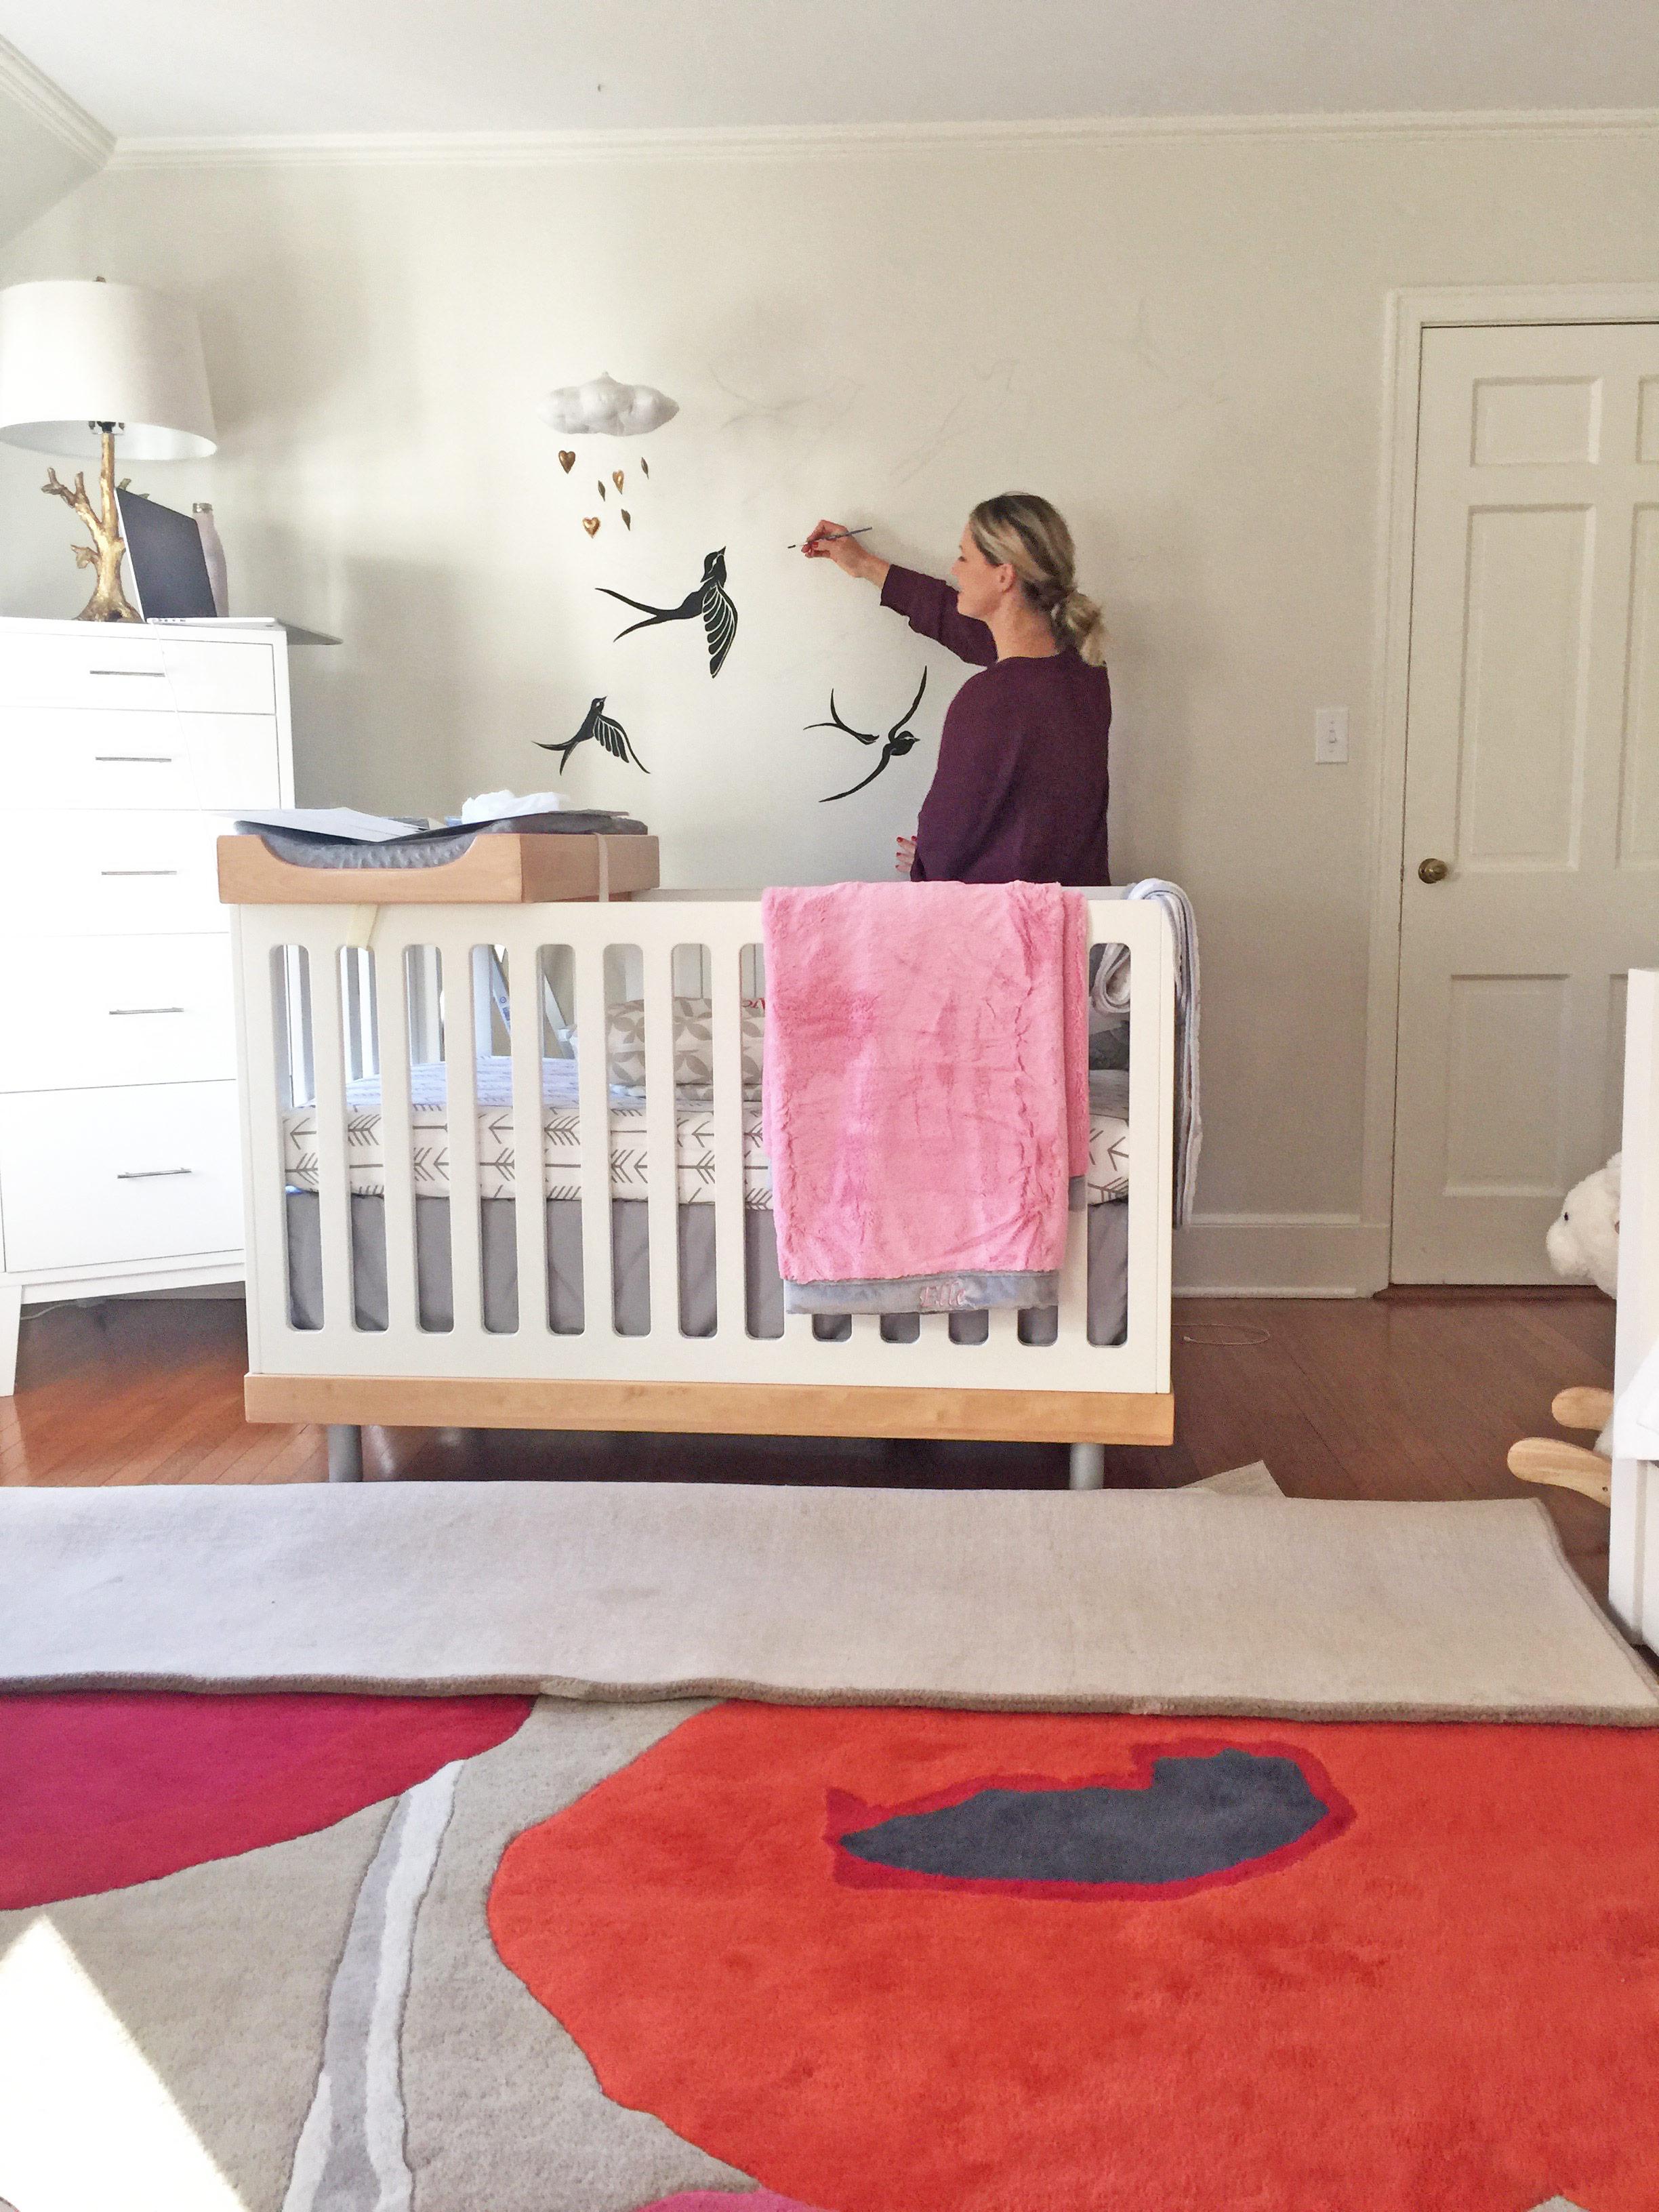 Ceci-Johnson-Nursery_Design_Illustration_Artwork_Ceci_new_York_baby_kids_design_room_4.jpg